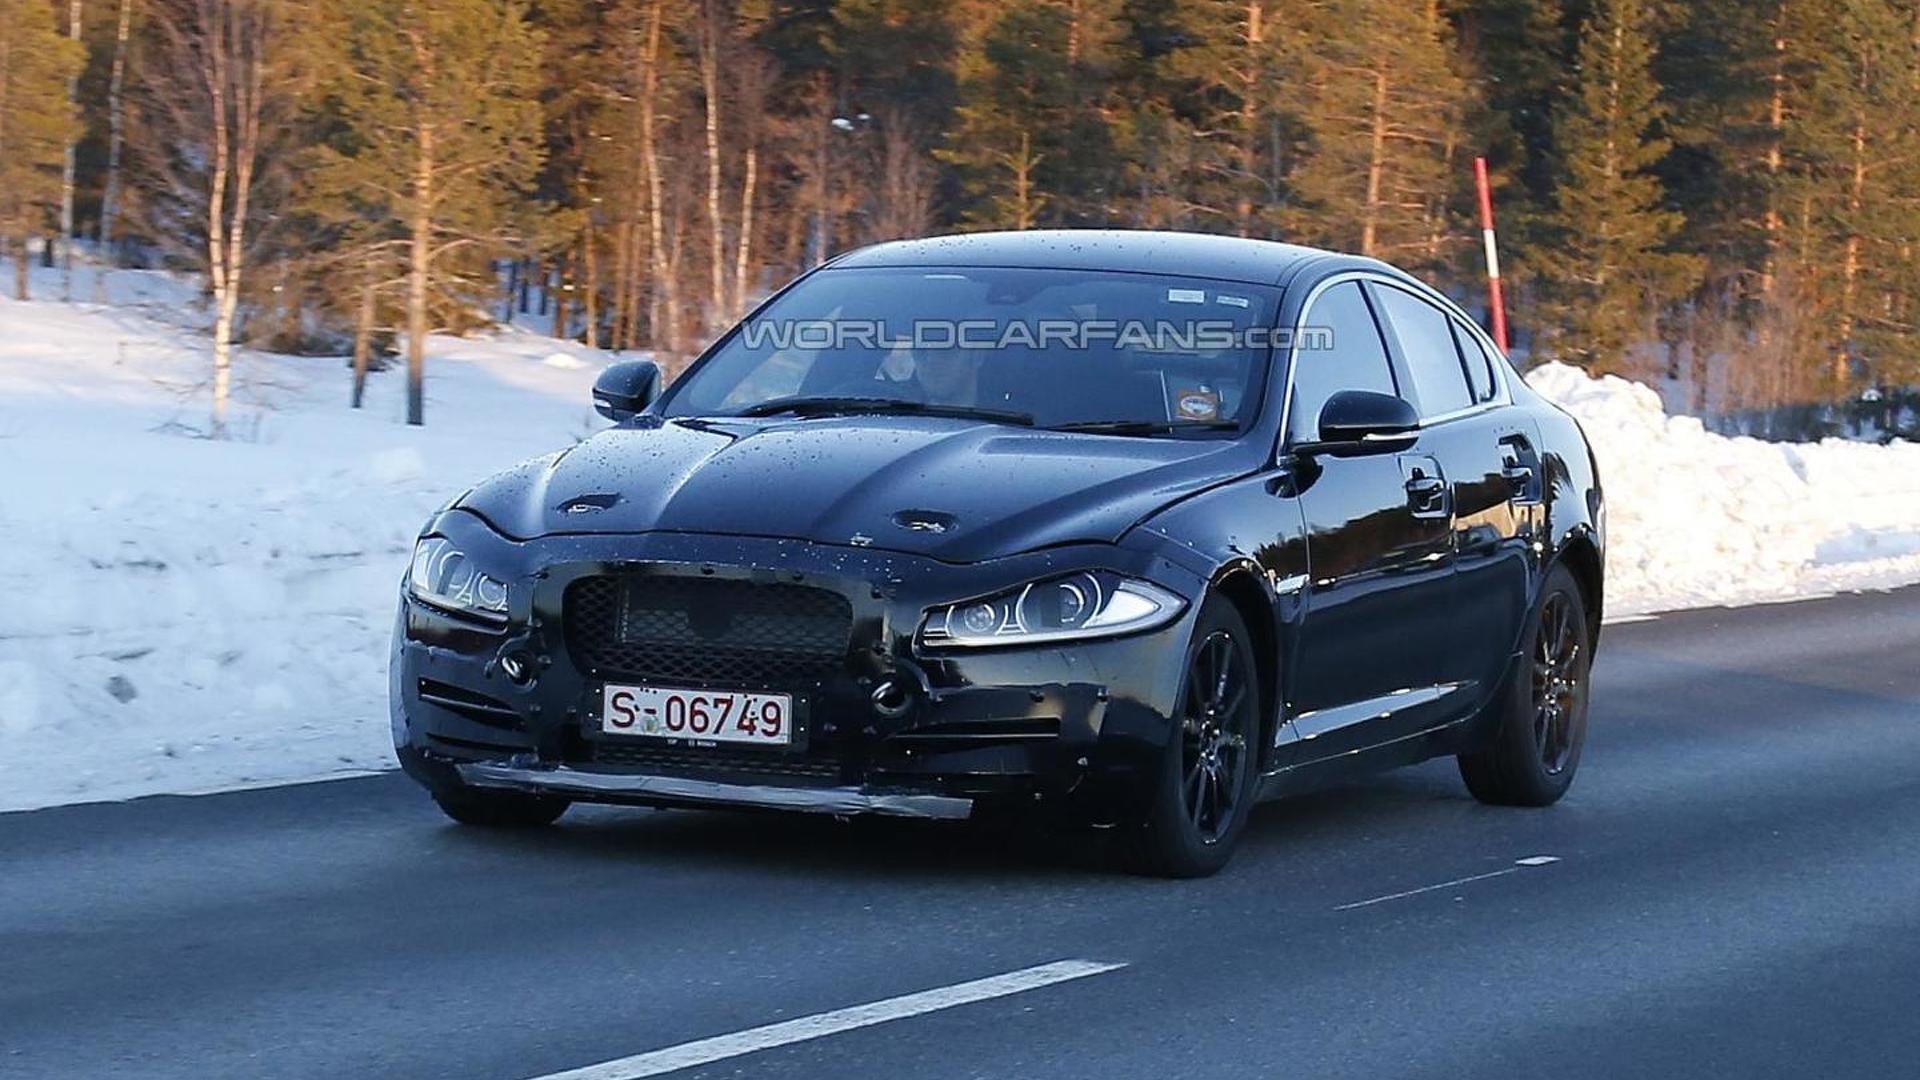 Jaguar's entry-level sedan to have